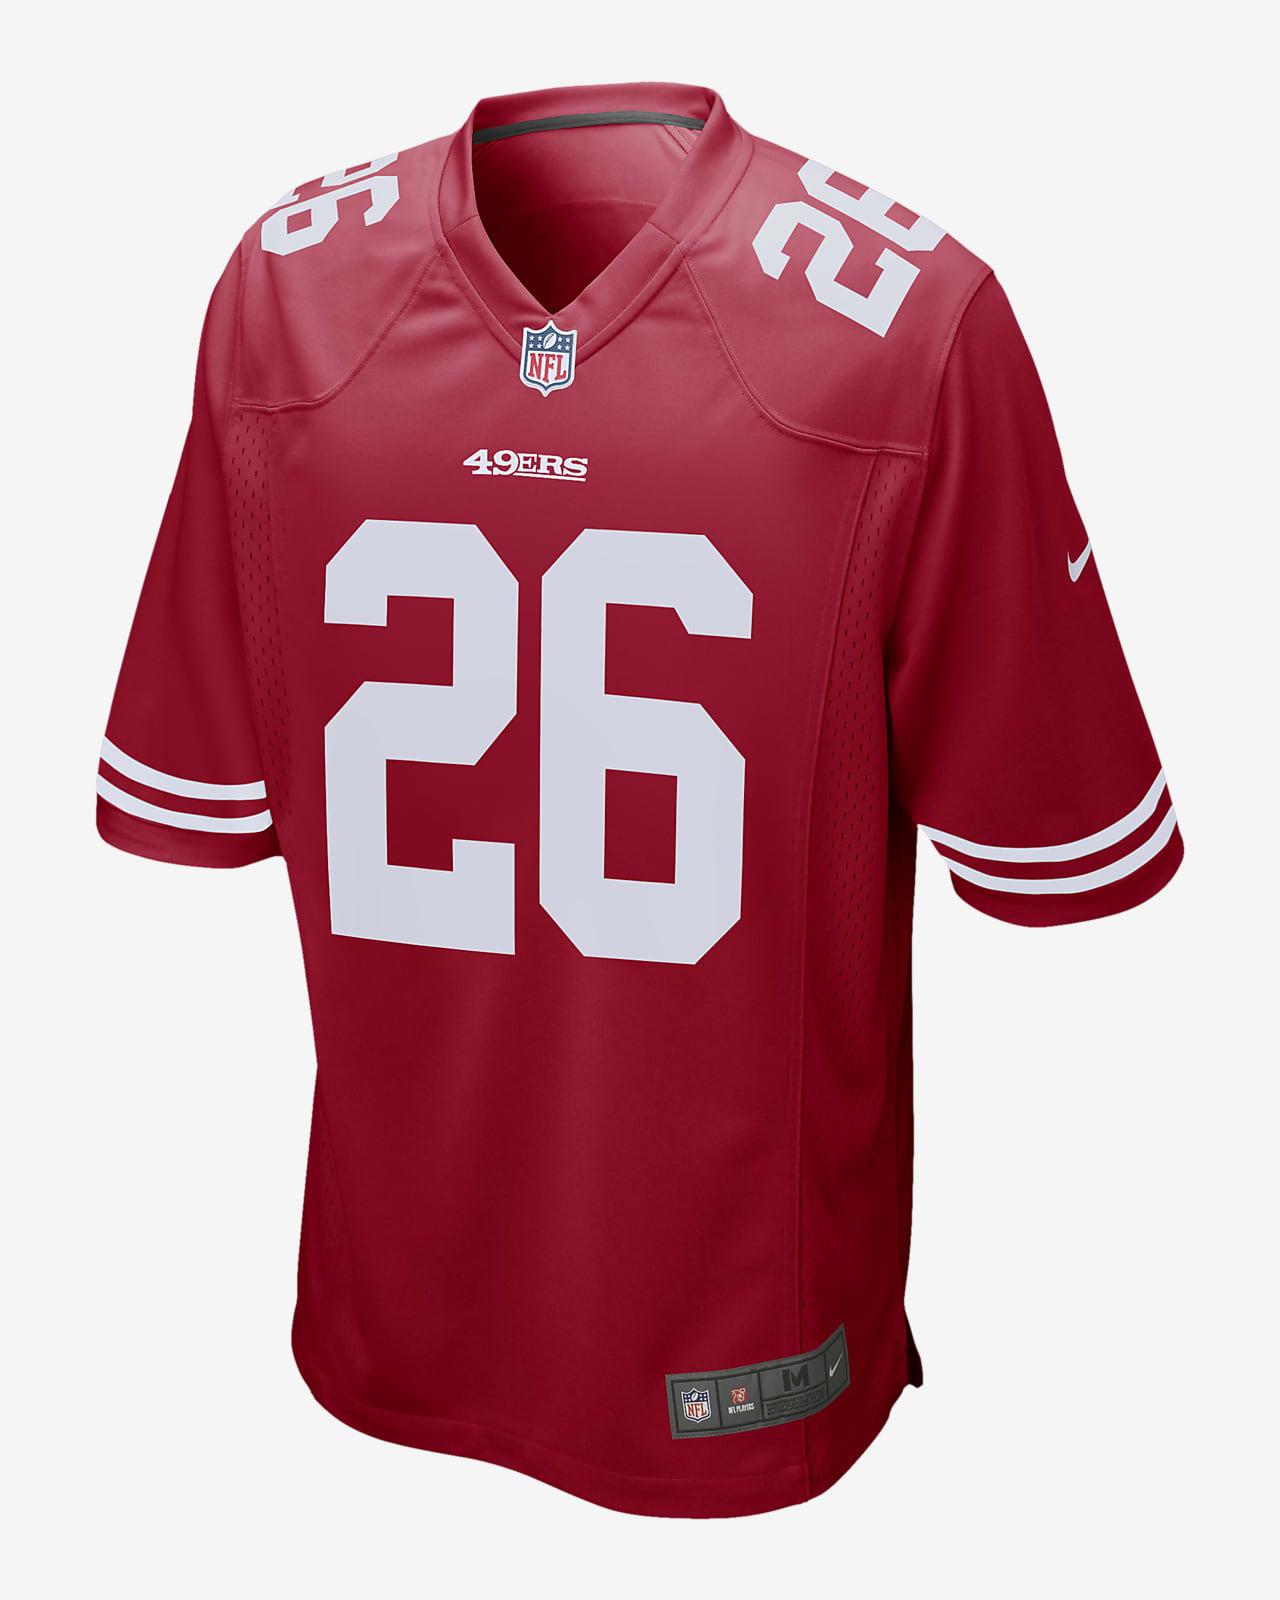 NFL San Francisco 49ers (Tevin Coleman) Men's Game Football Jersey